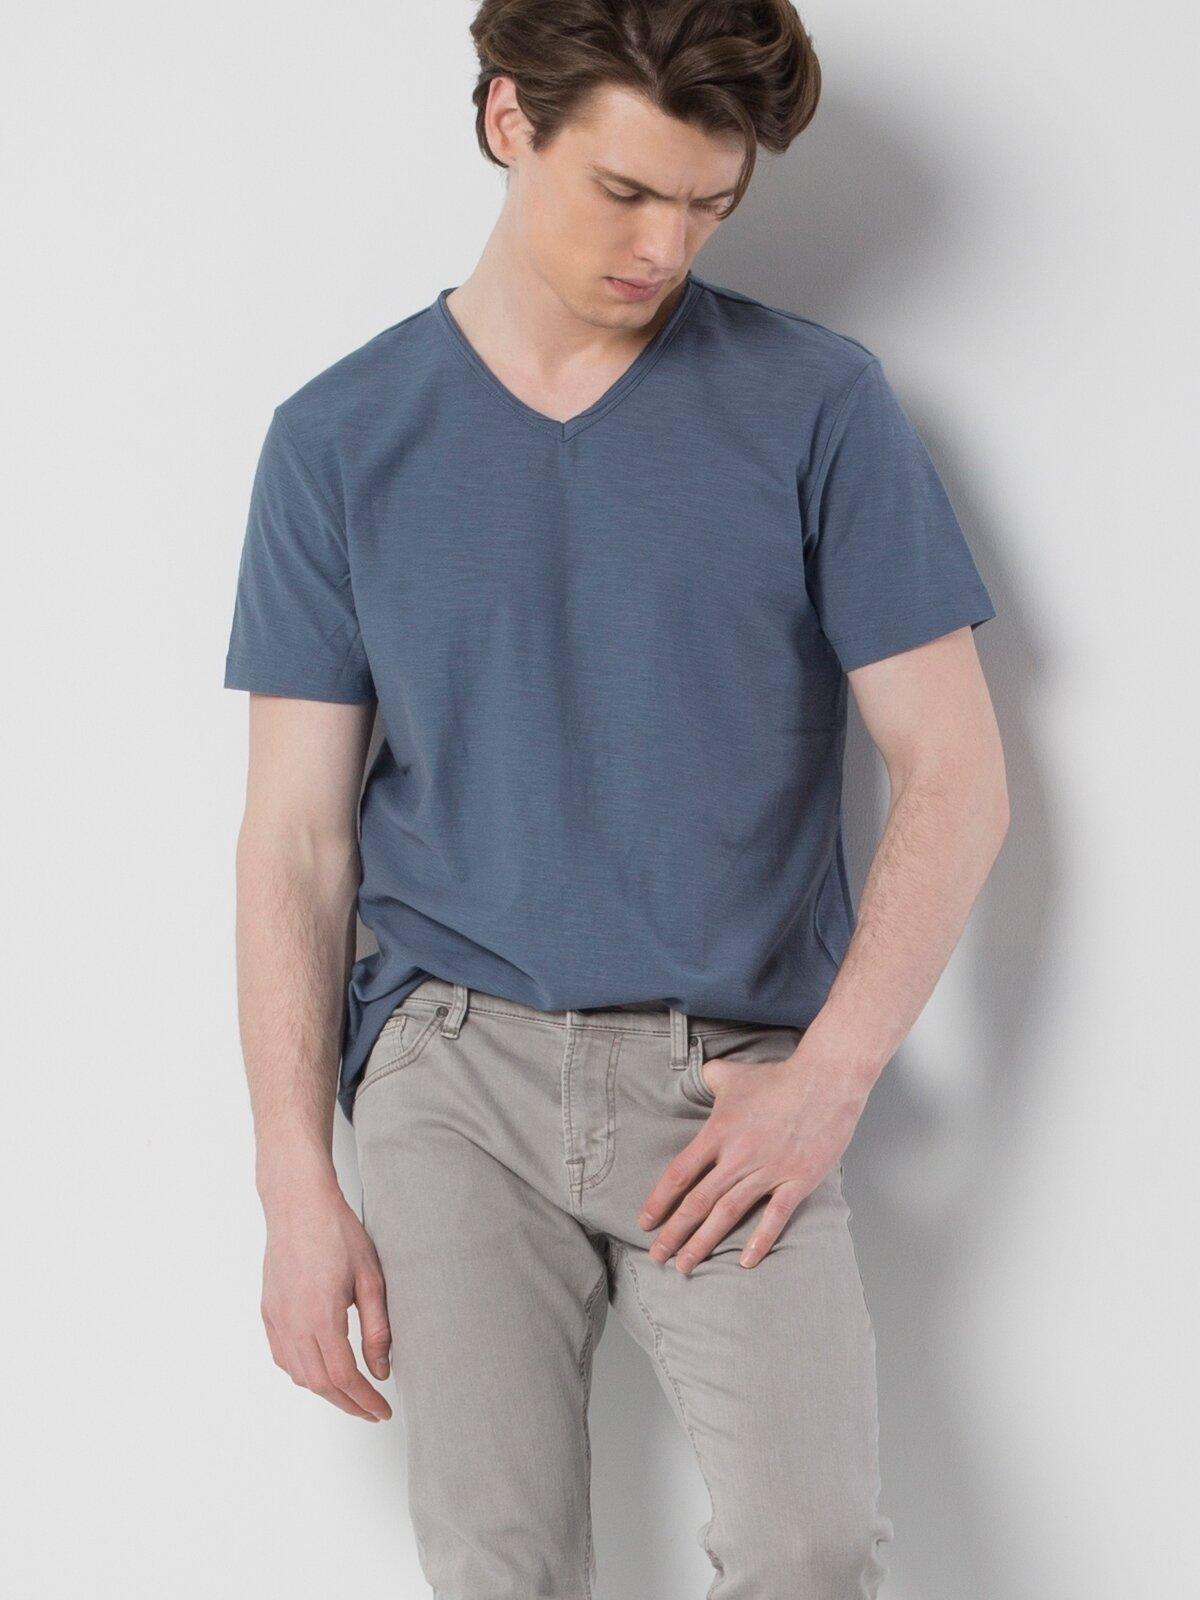 İndigo V Yaka Kısa Kol Tişört